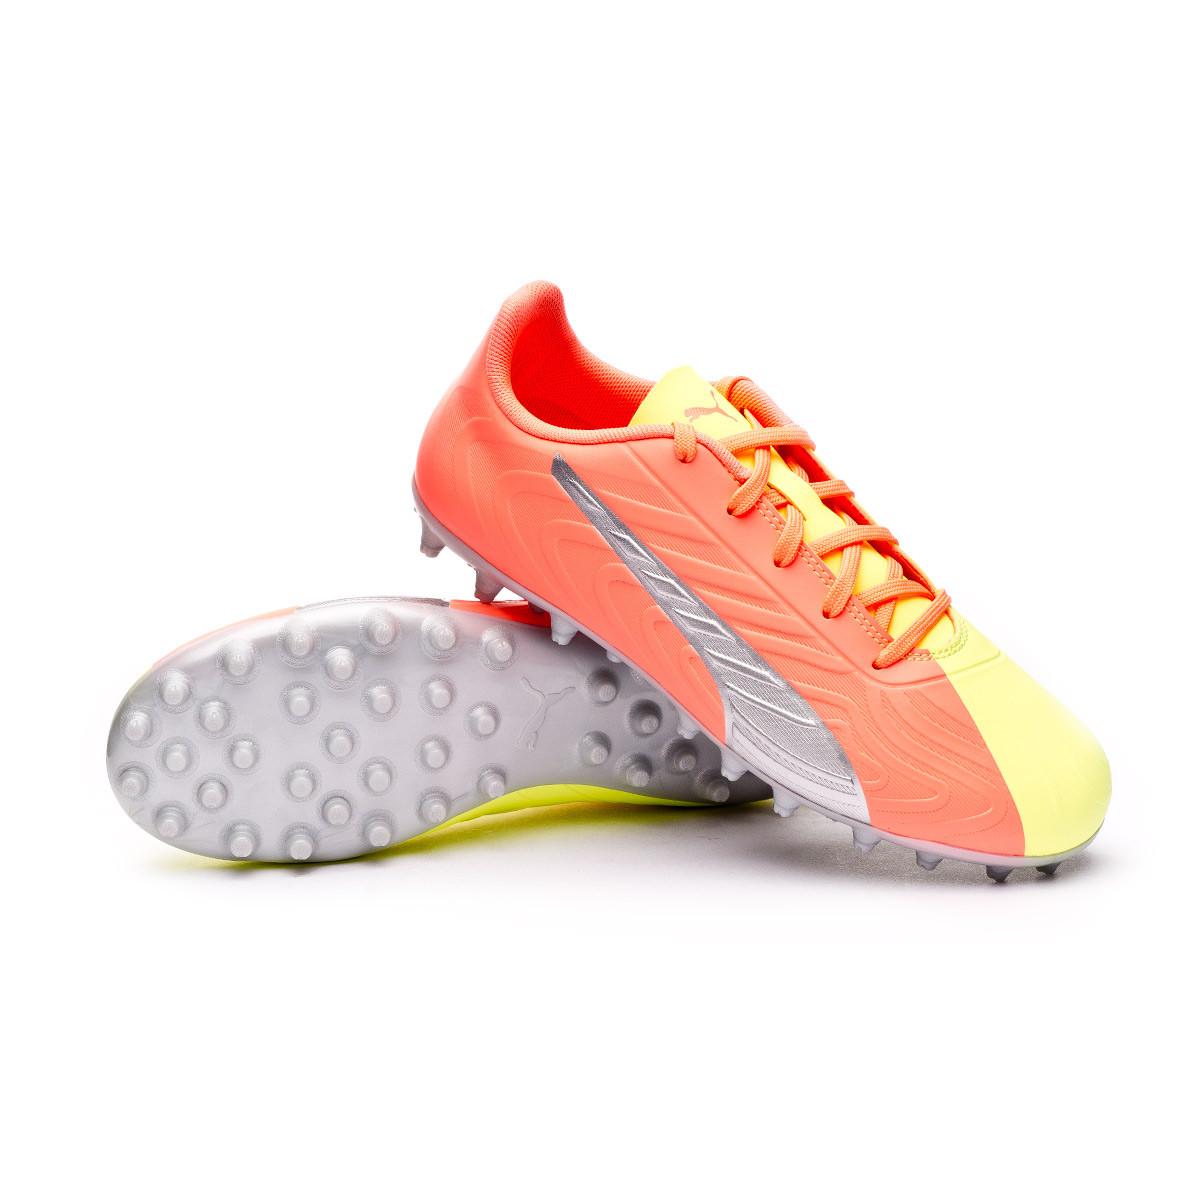 Puma One 20.4 MG OSG Niño Football Boots